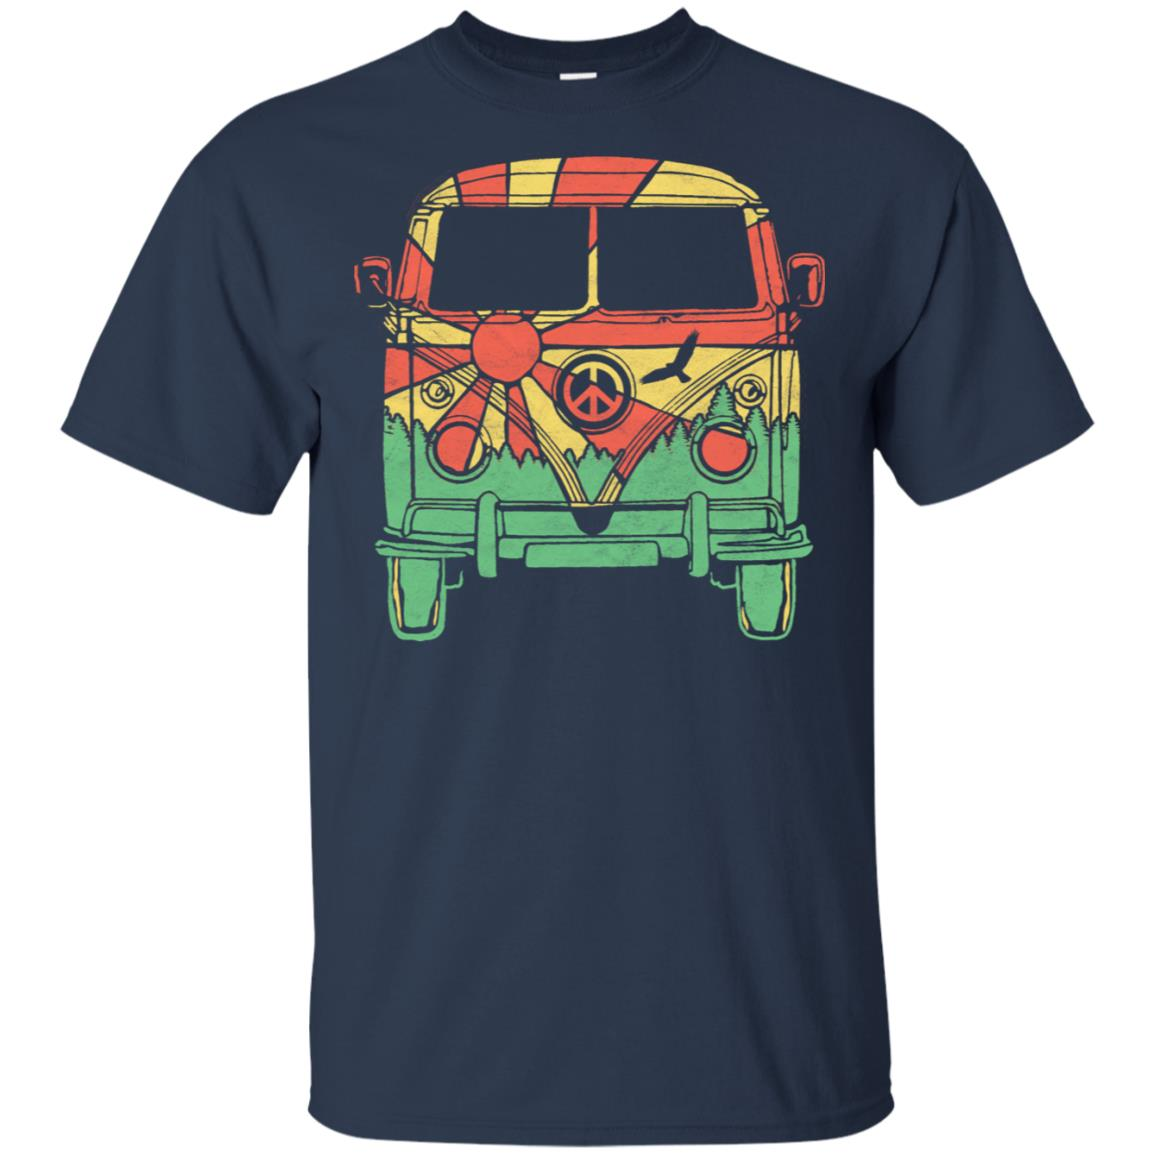 Retro Hippie Van Camper Vintage Nature Tee Unisex Short Sleeve